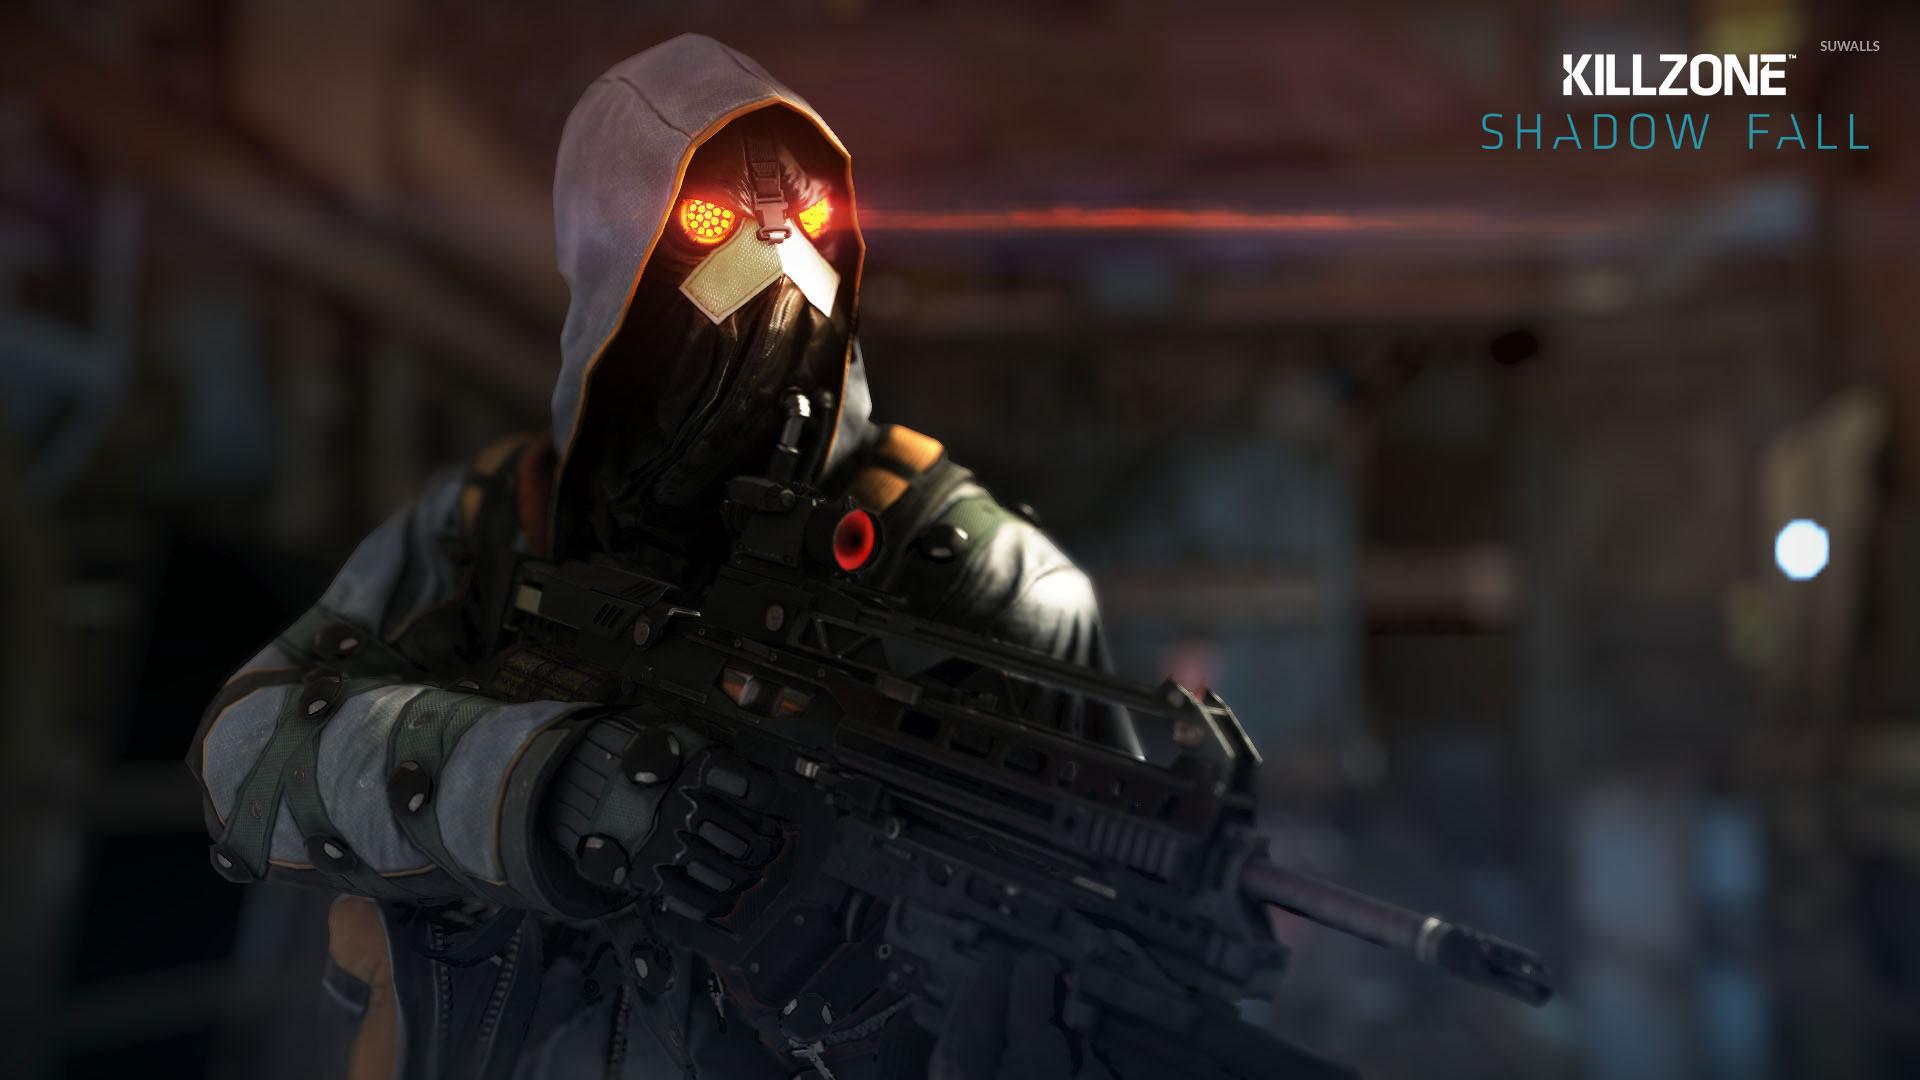 Killzone: Shadow Fall wallpaper – Game wallpapers – #24129